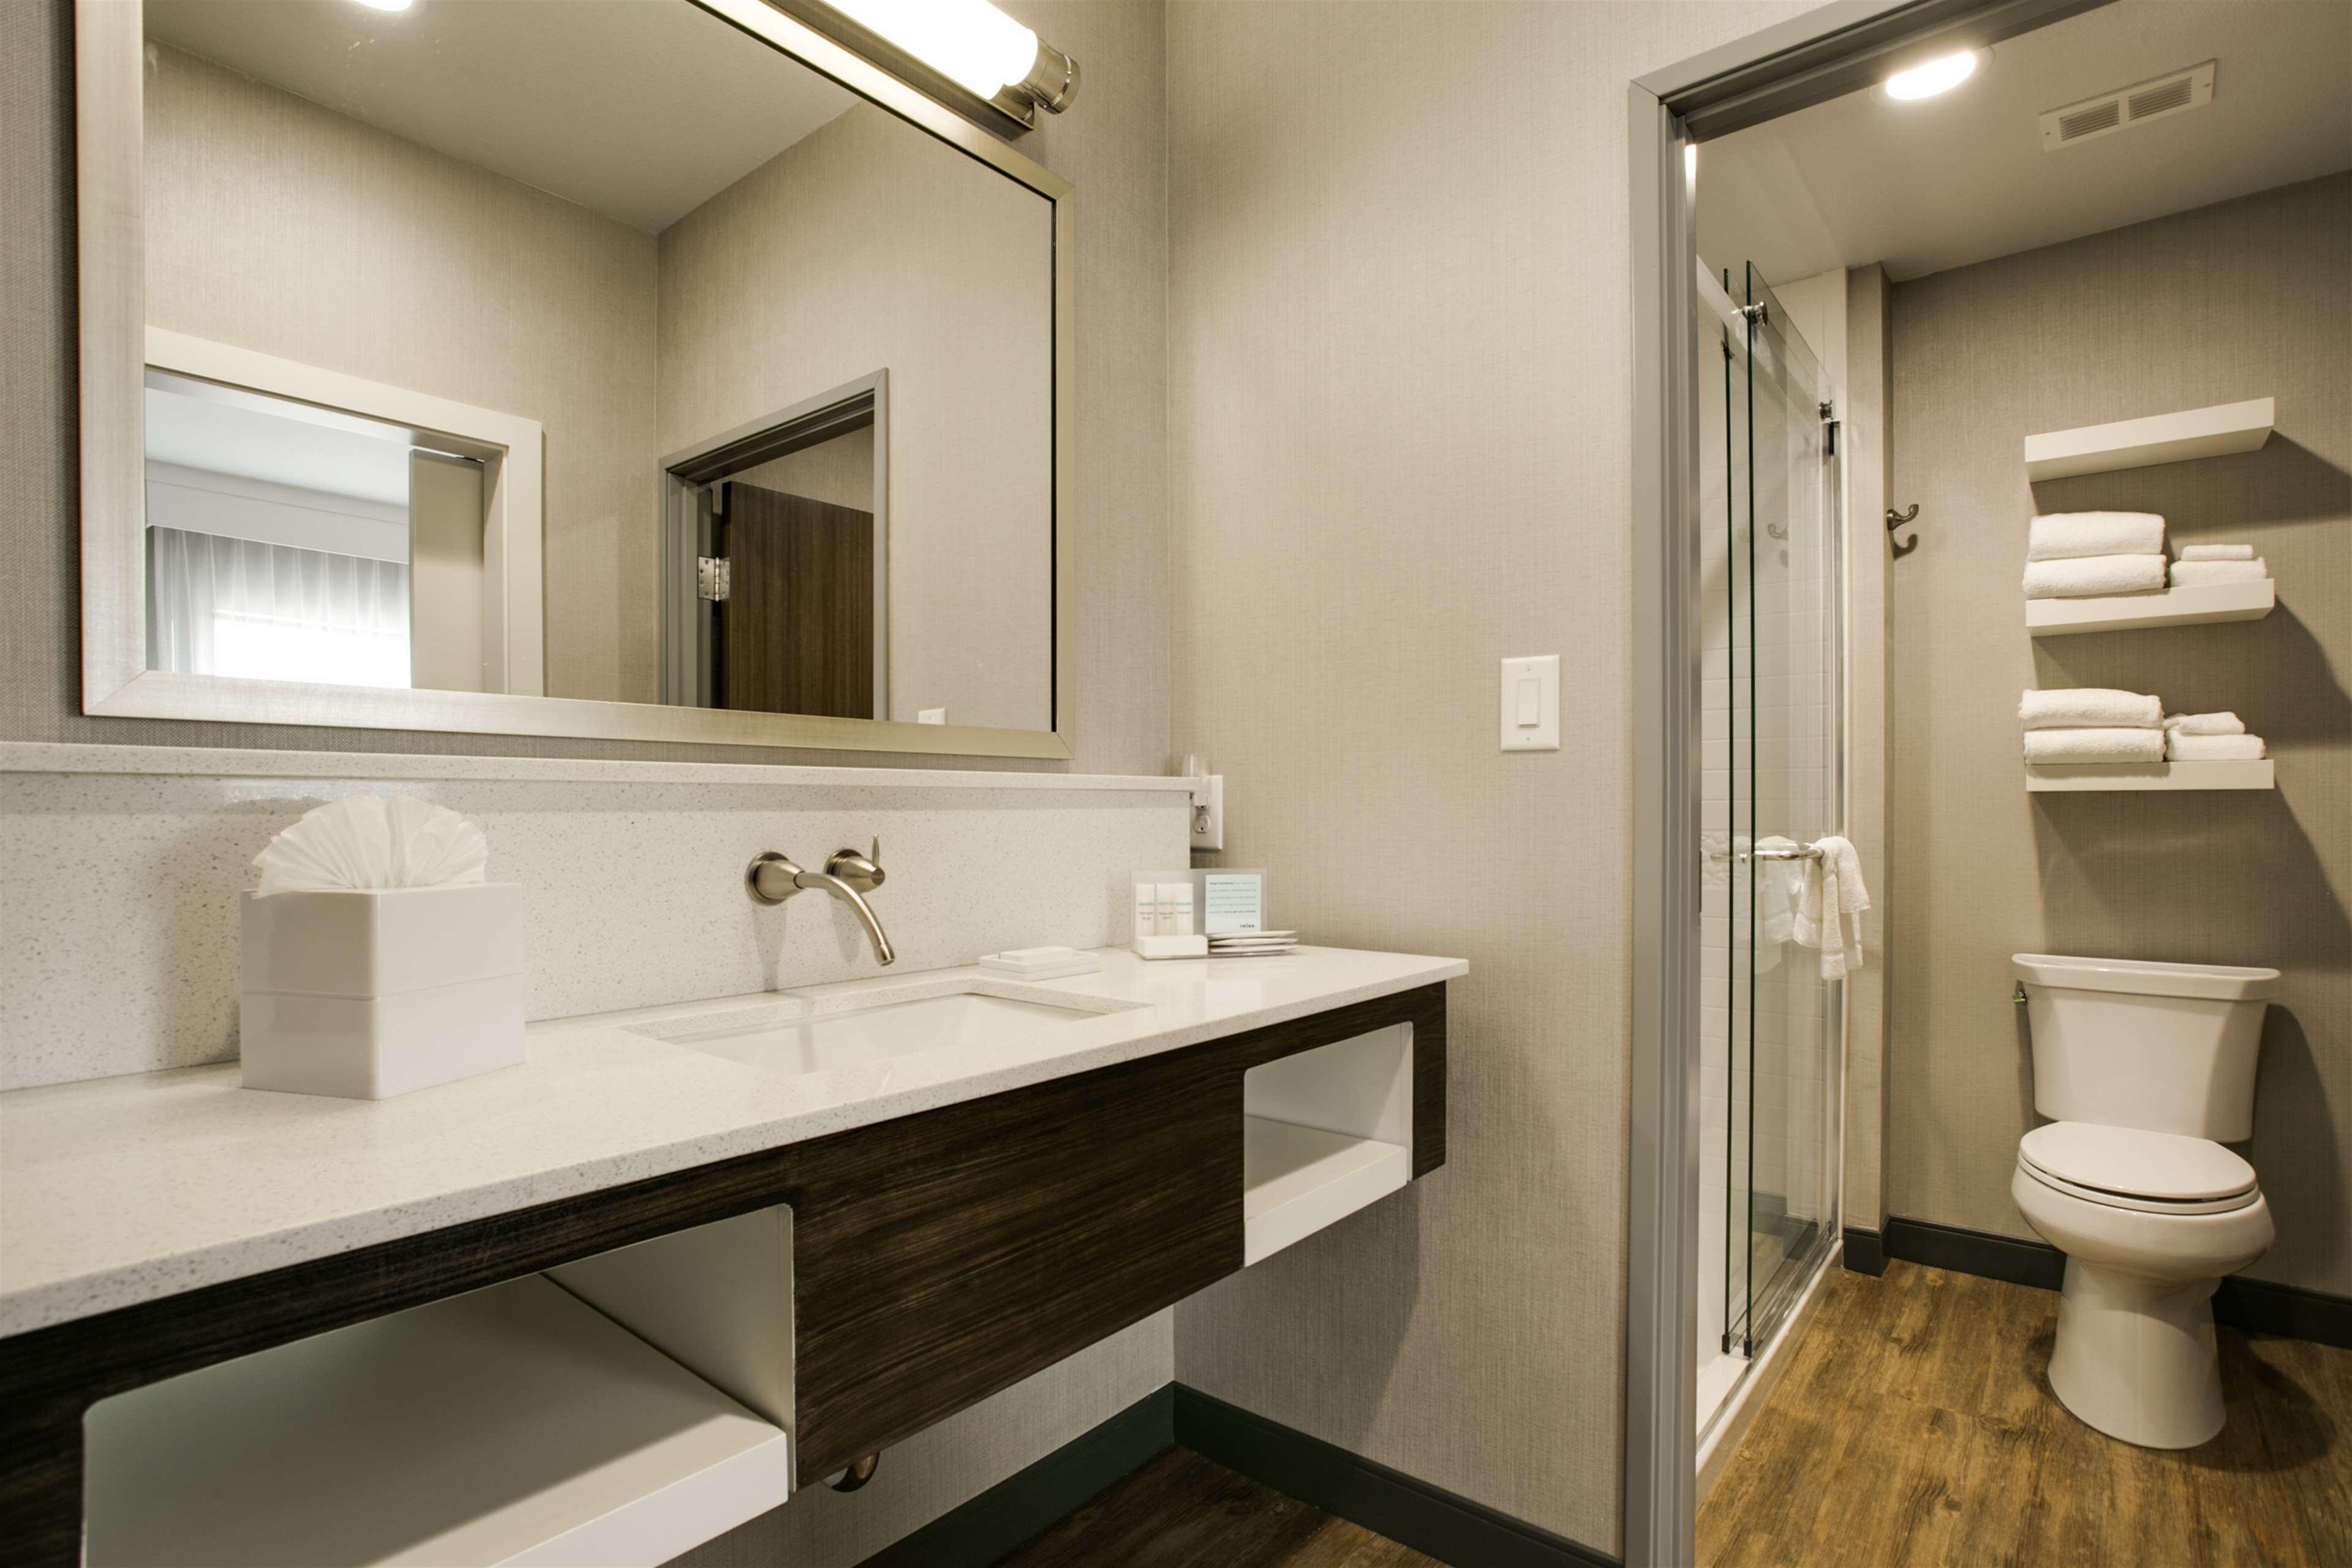 Hampton Inn & Suites Dallas/Ft. Worth Airport South image 24